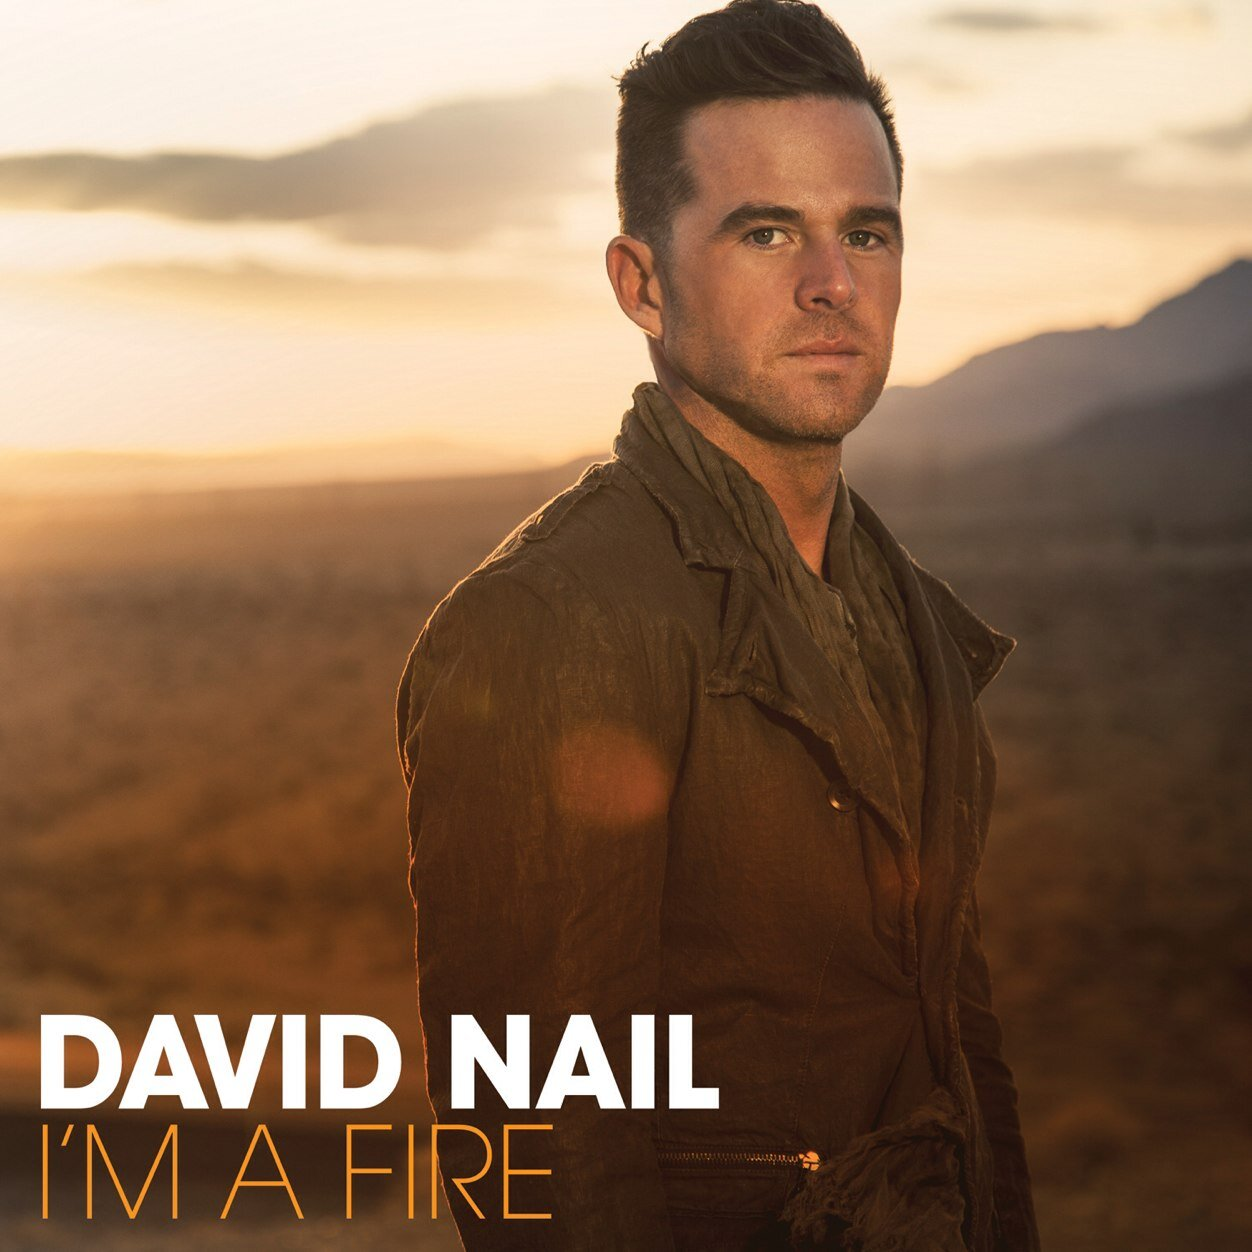 David Nail Fan Page (@DavidNail1979) | Twitter